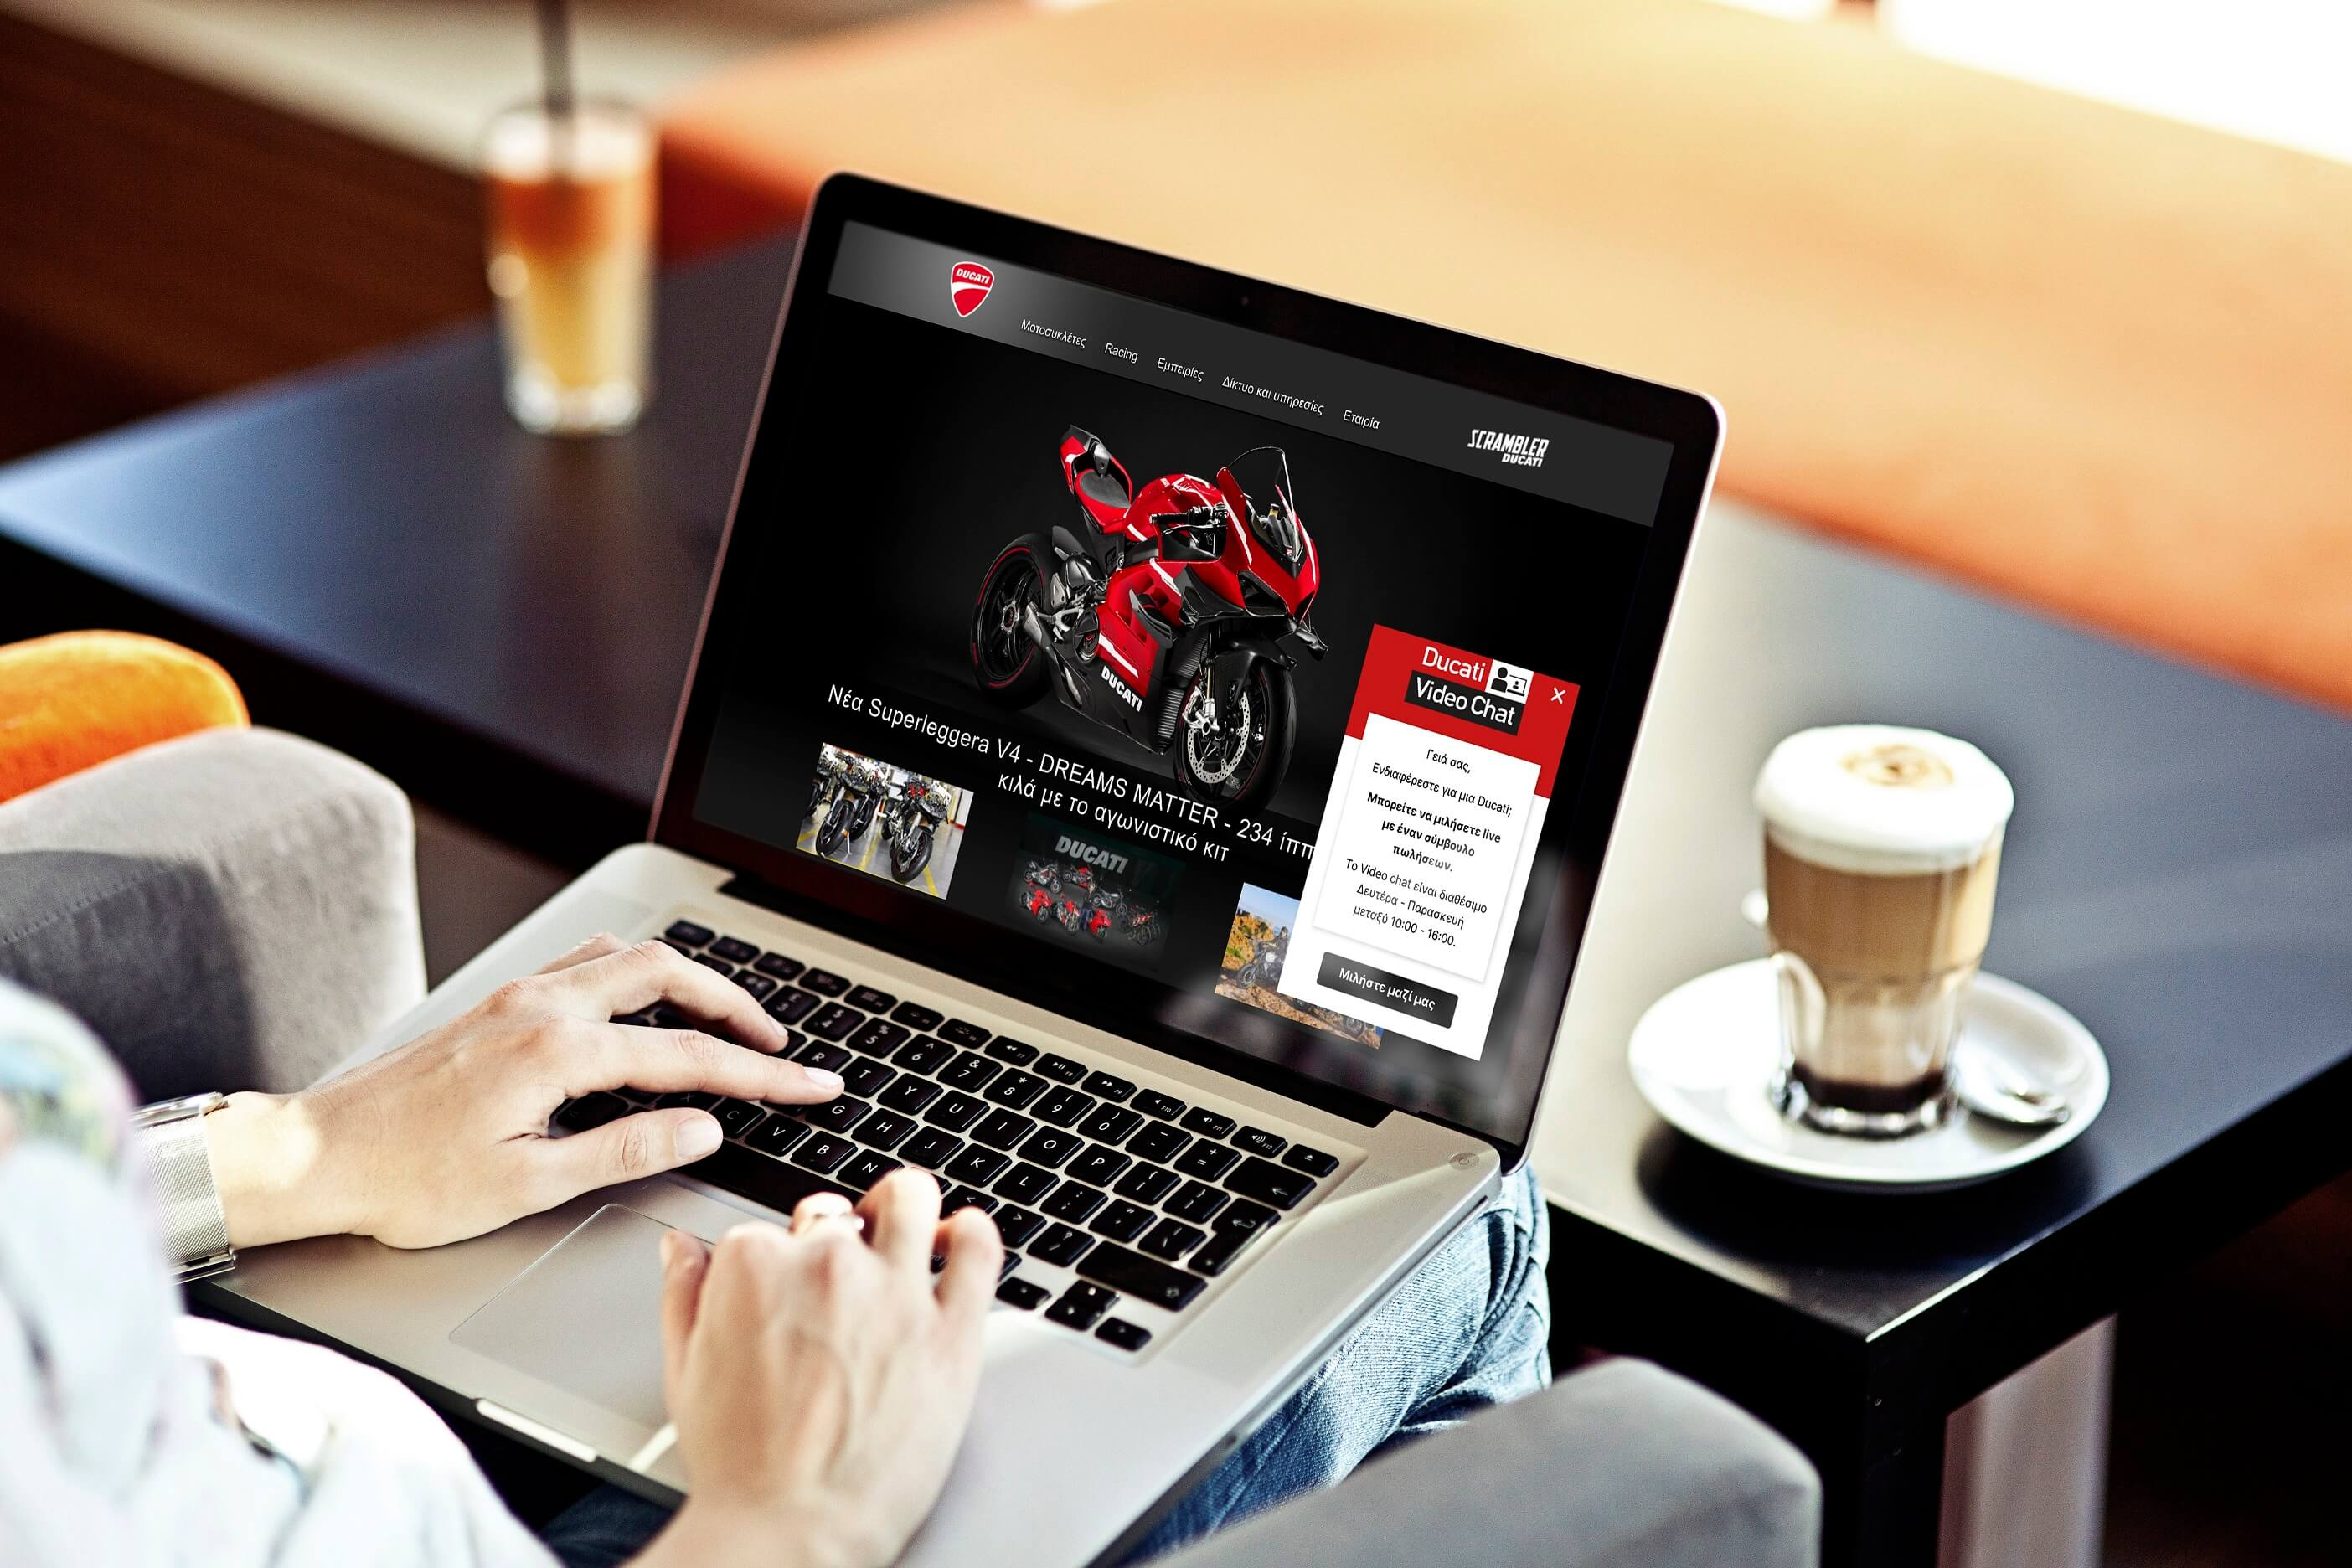 Ducati Video Chat - Οθόνη χρήστη που πλοηγείται στο Ducati website